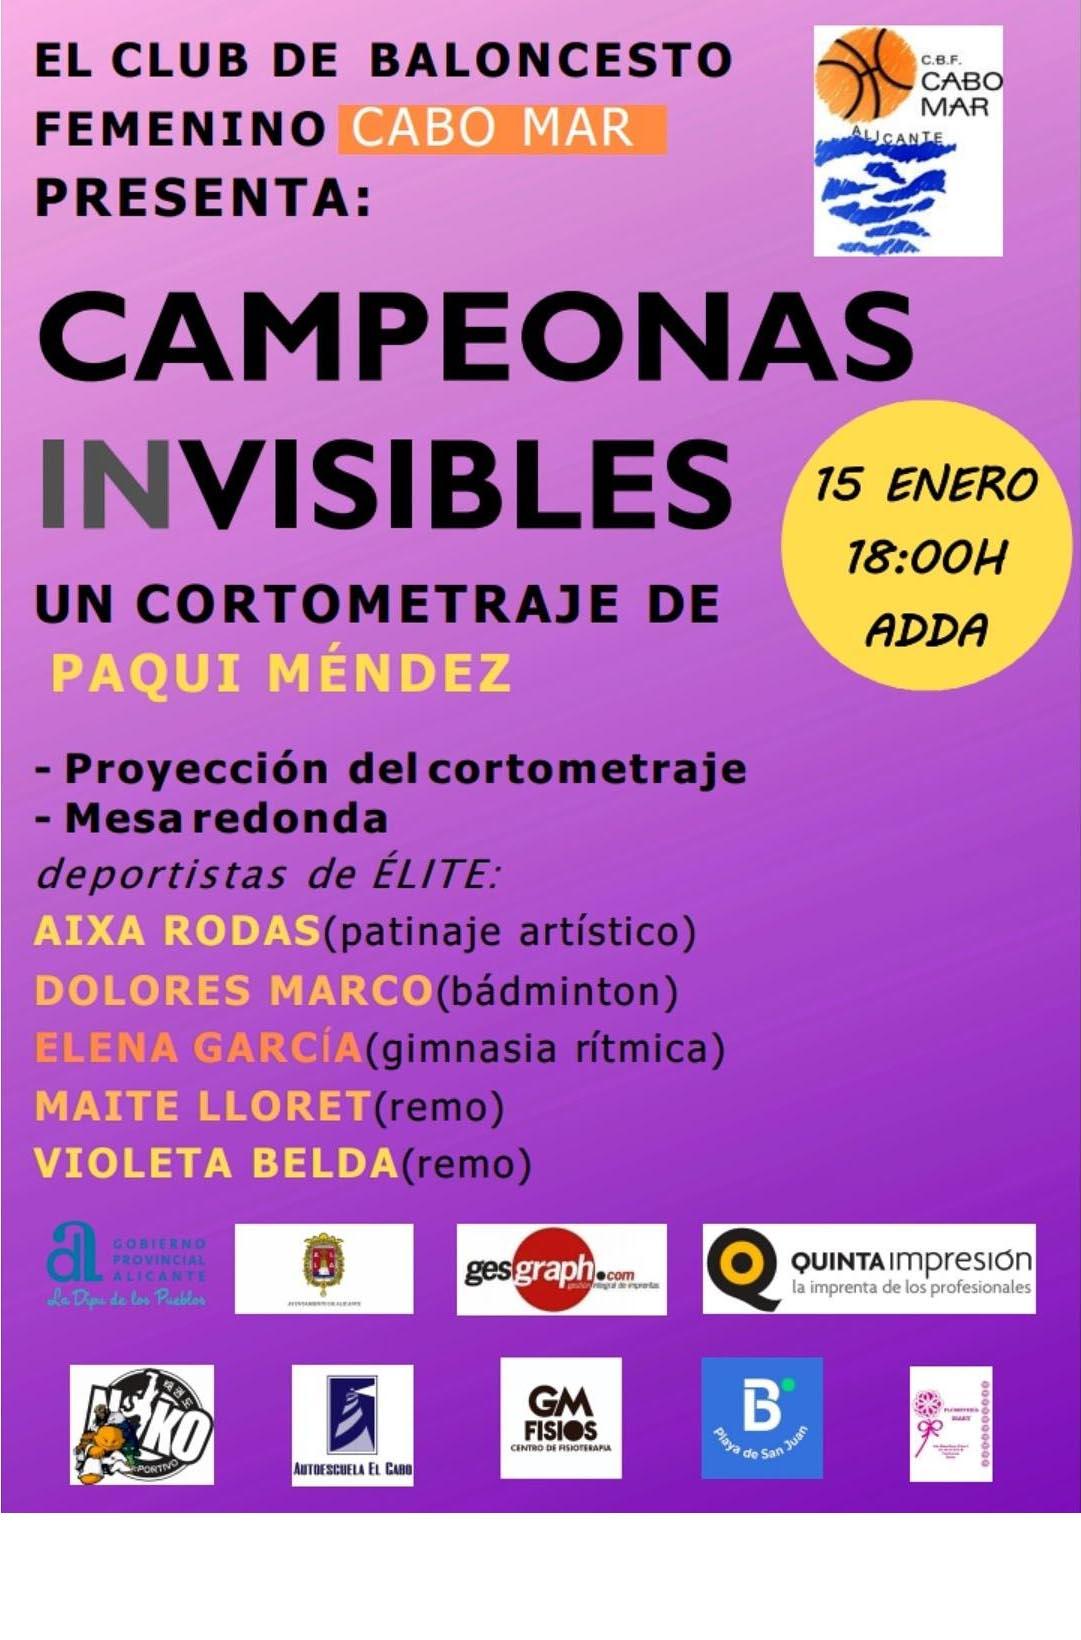 Campeonas invisibles